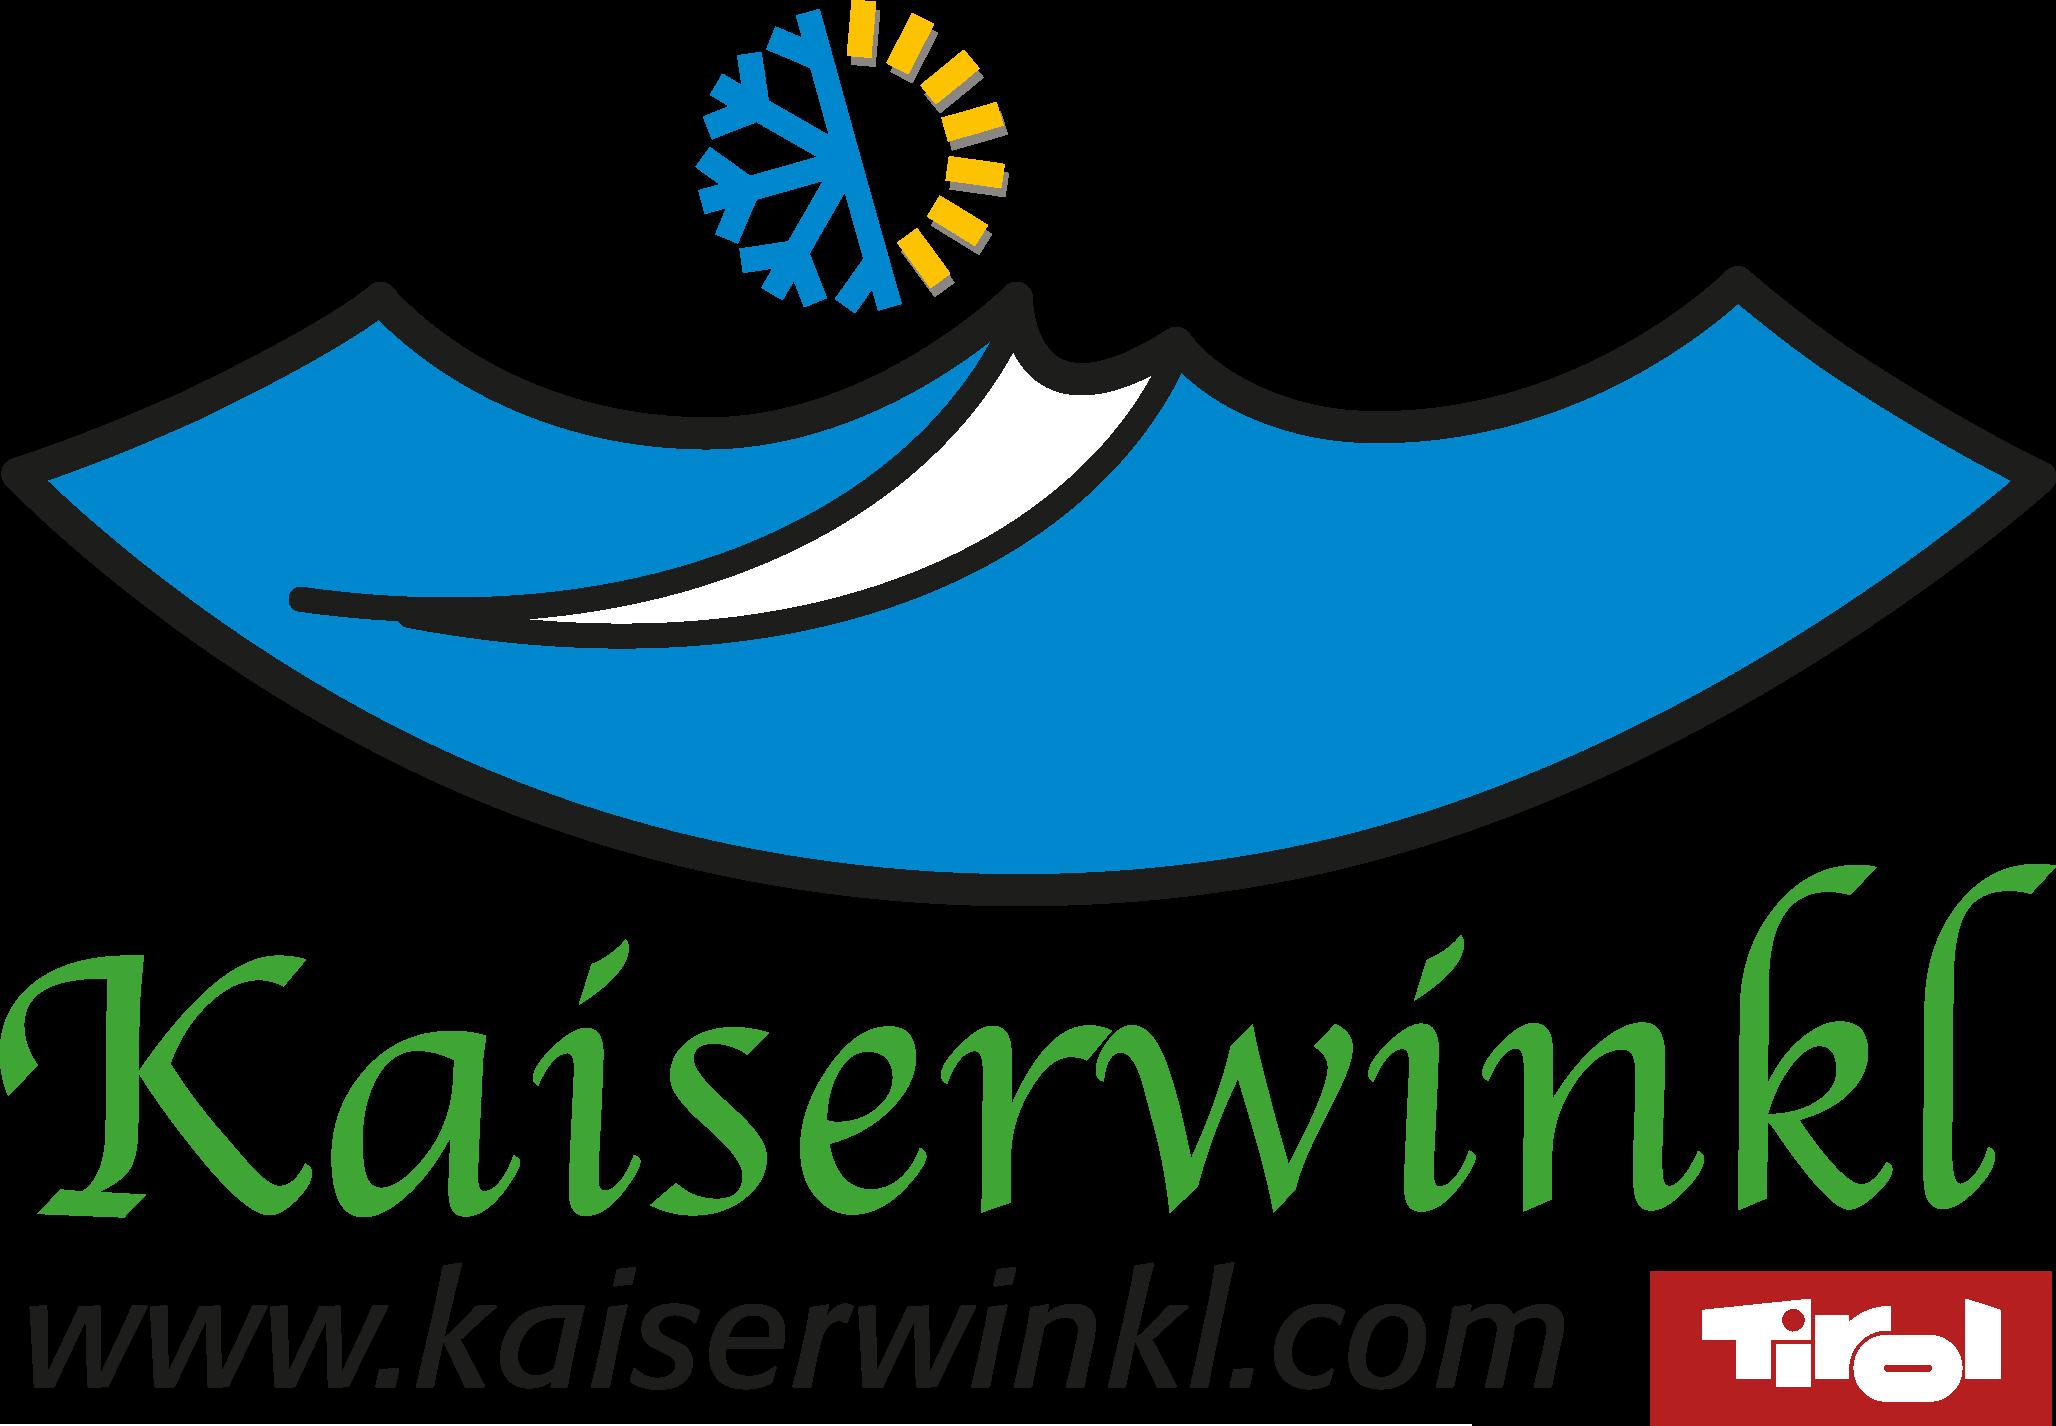 Kaiserwinkl